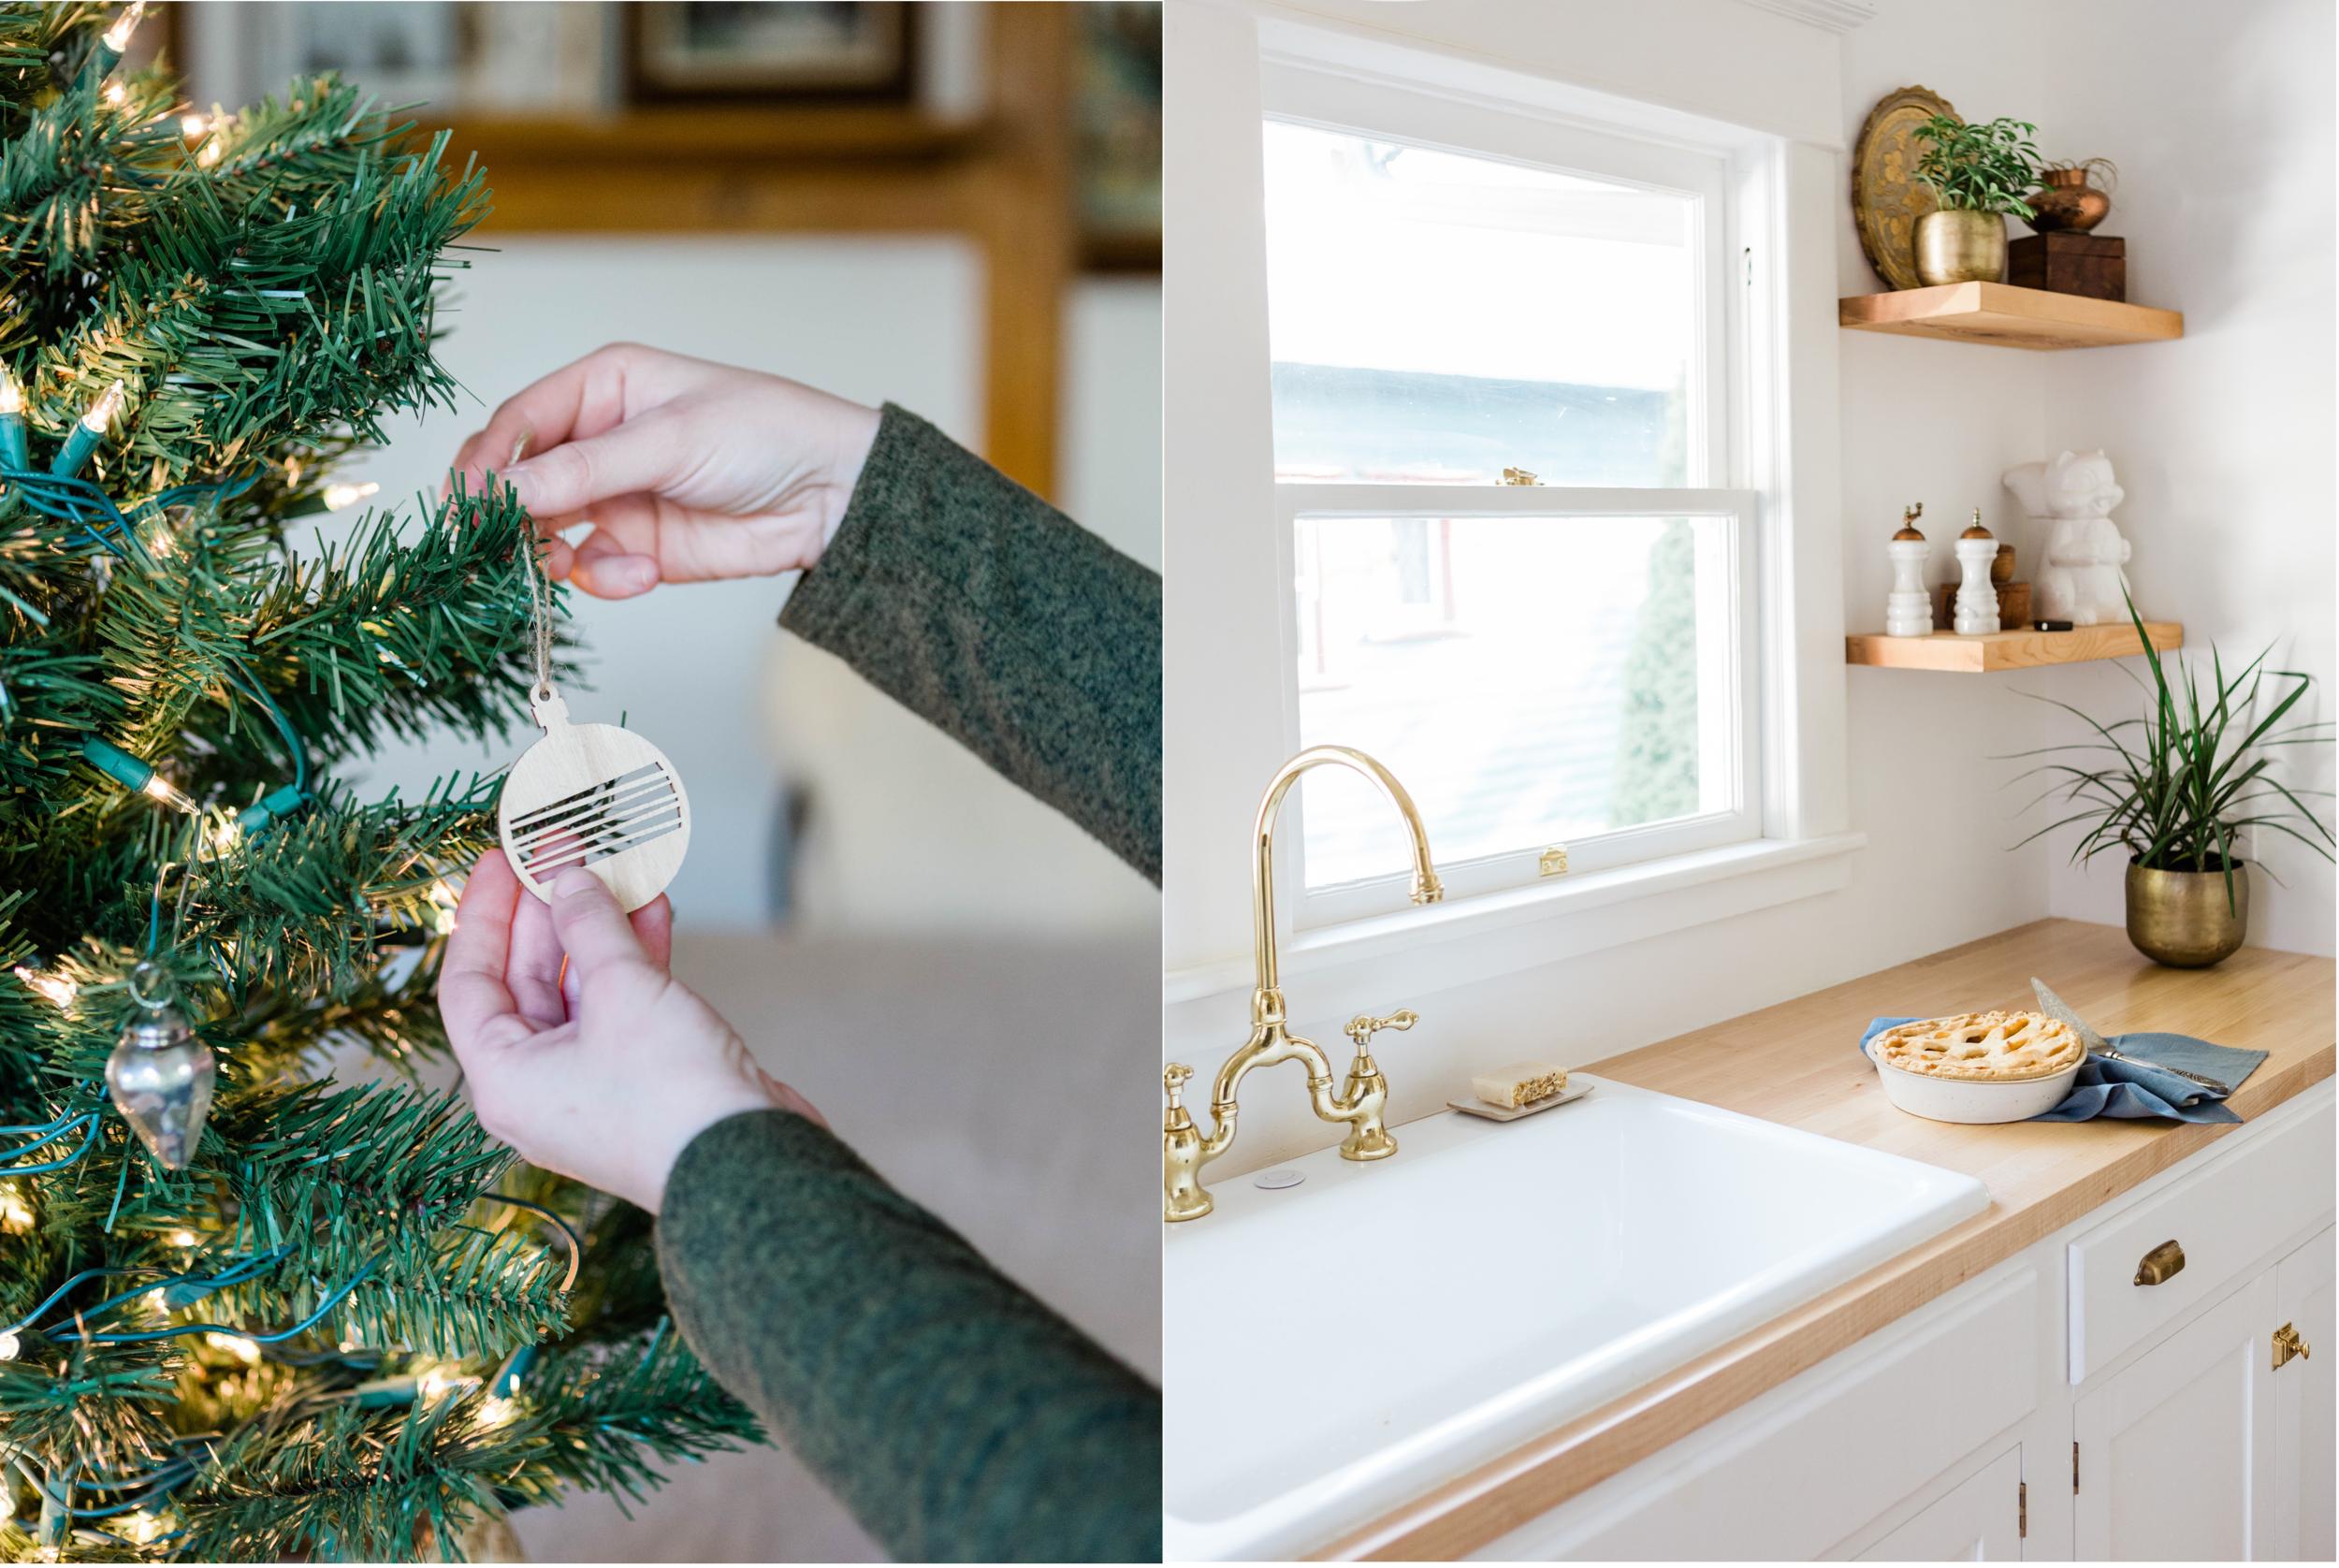 Wood ornaments    Pie dish    Linen tea towel    Brass planters    Soap dish